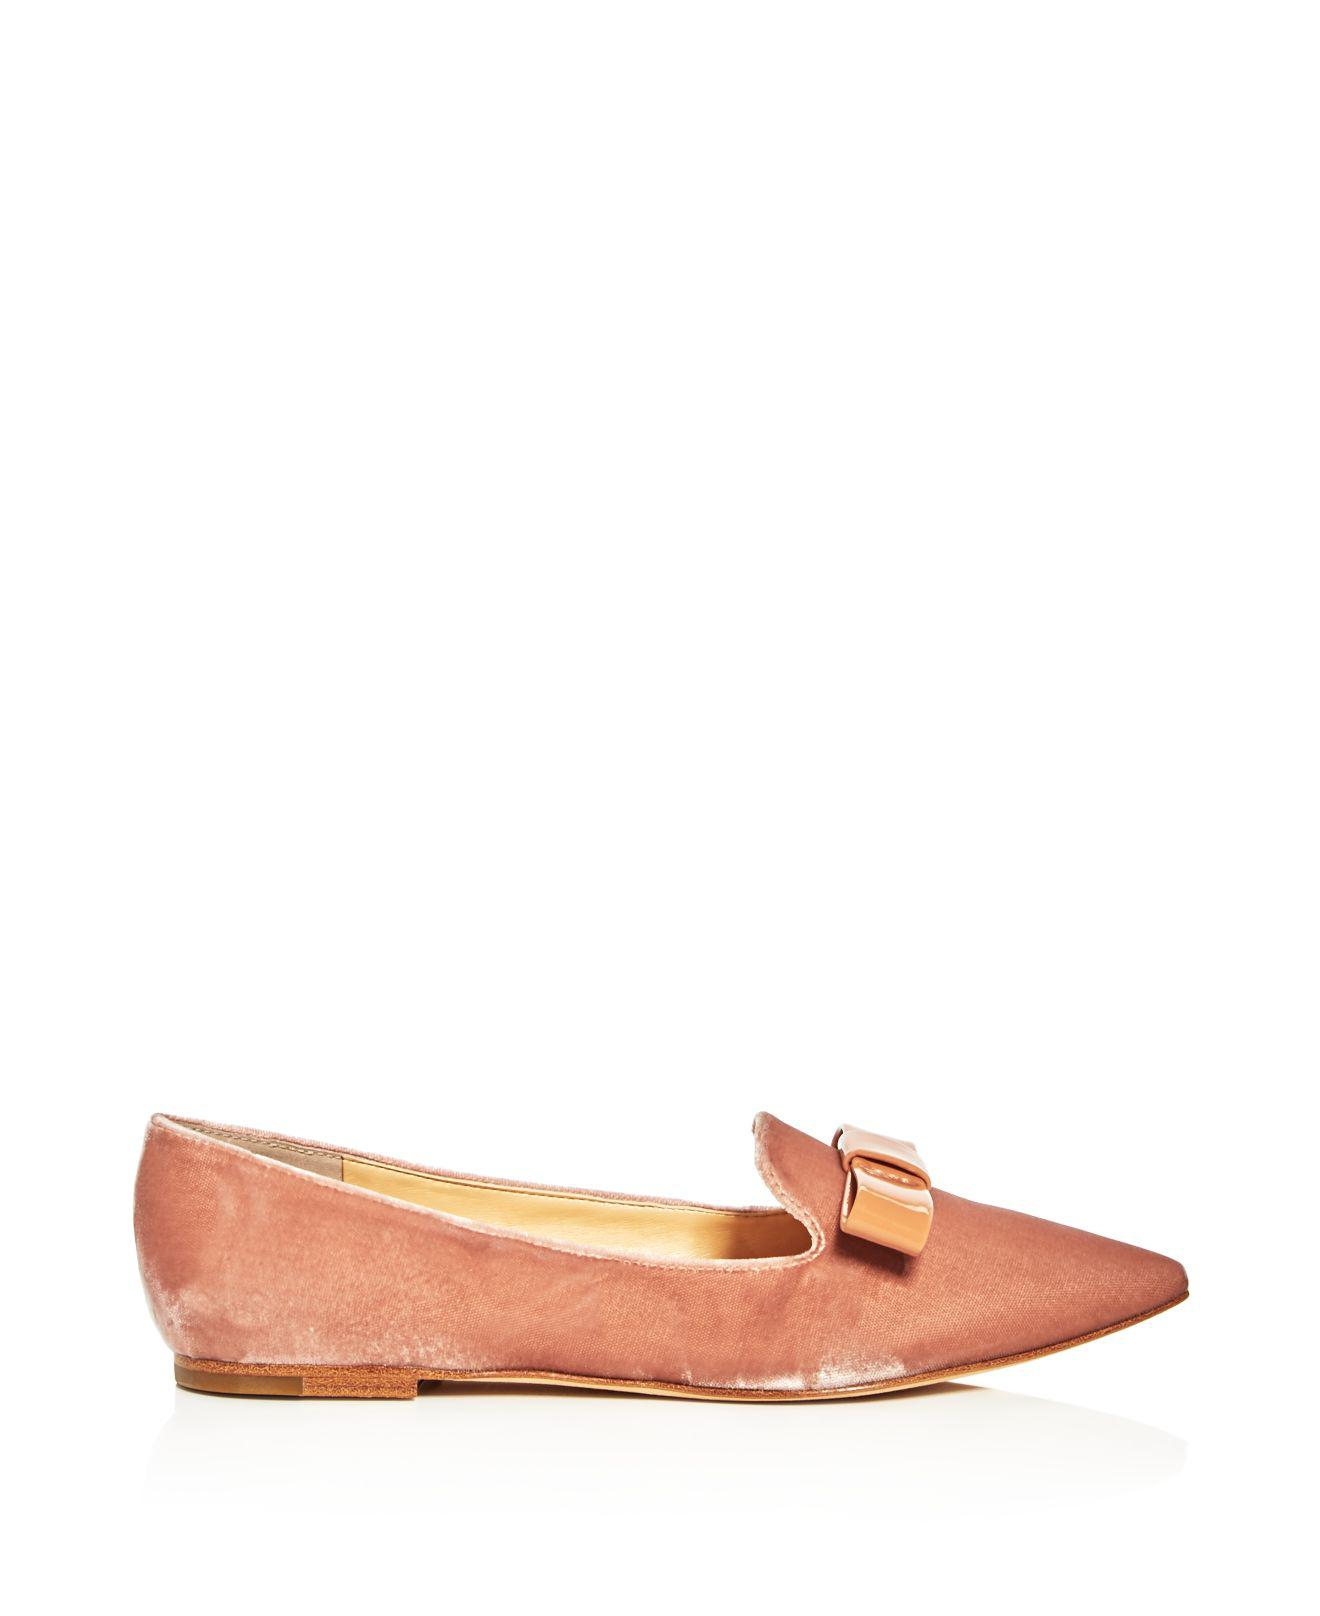 Ivanka Trump Lelle Velvet Pointed Toe Flats hZgPWzG